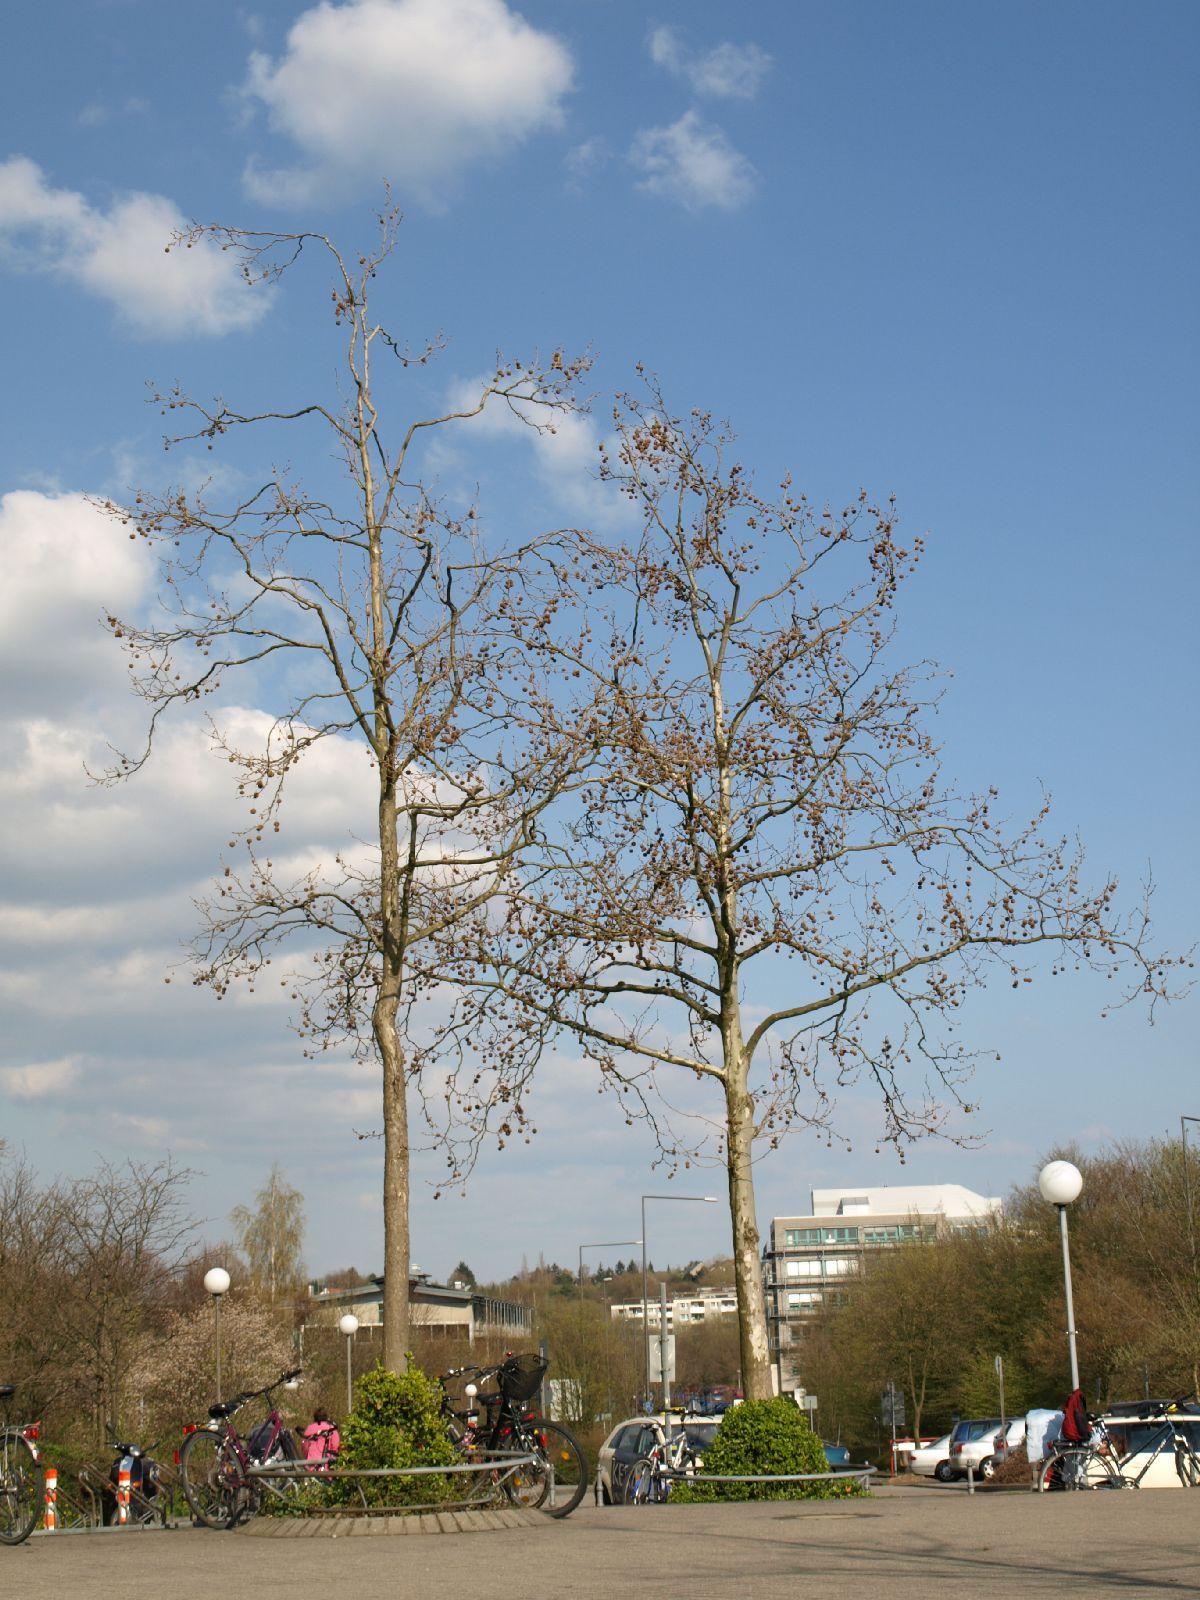 Pflanzen-Baum-Silhouette-Foto_Textur_B_P4171346